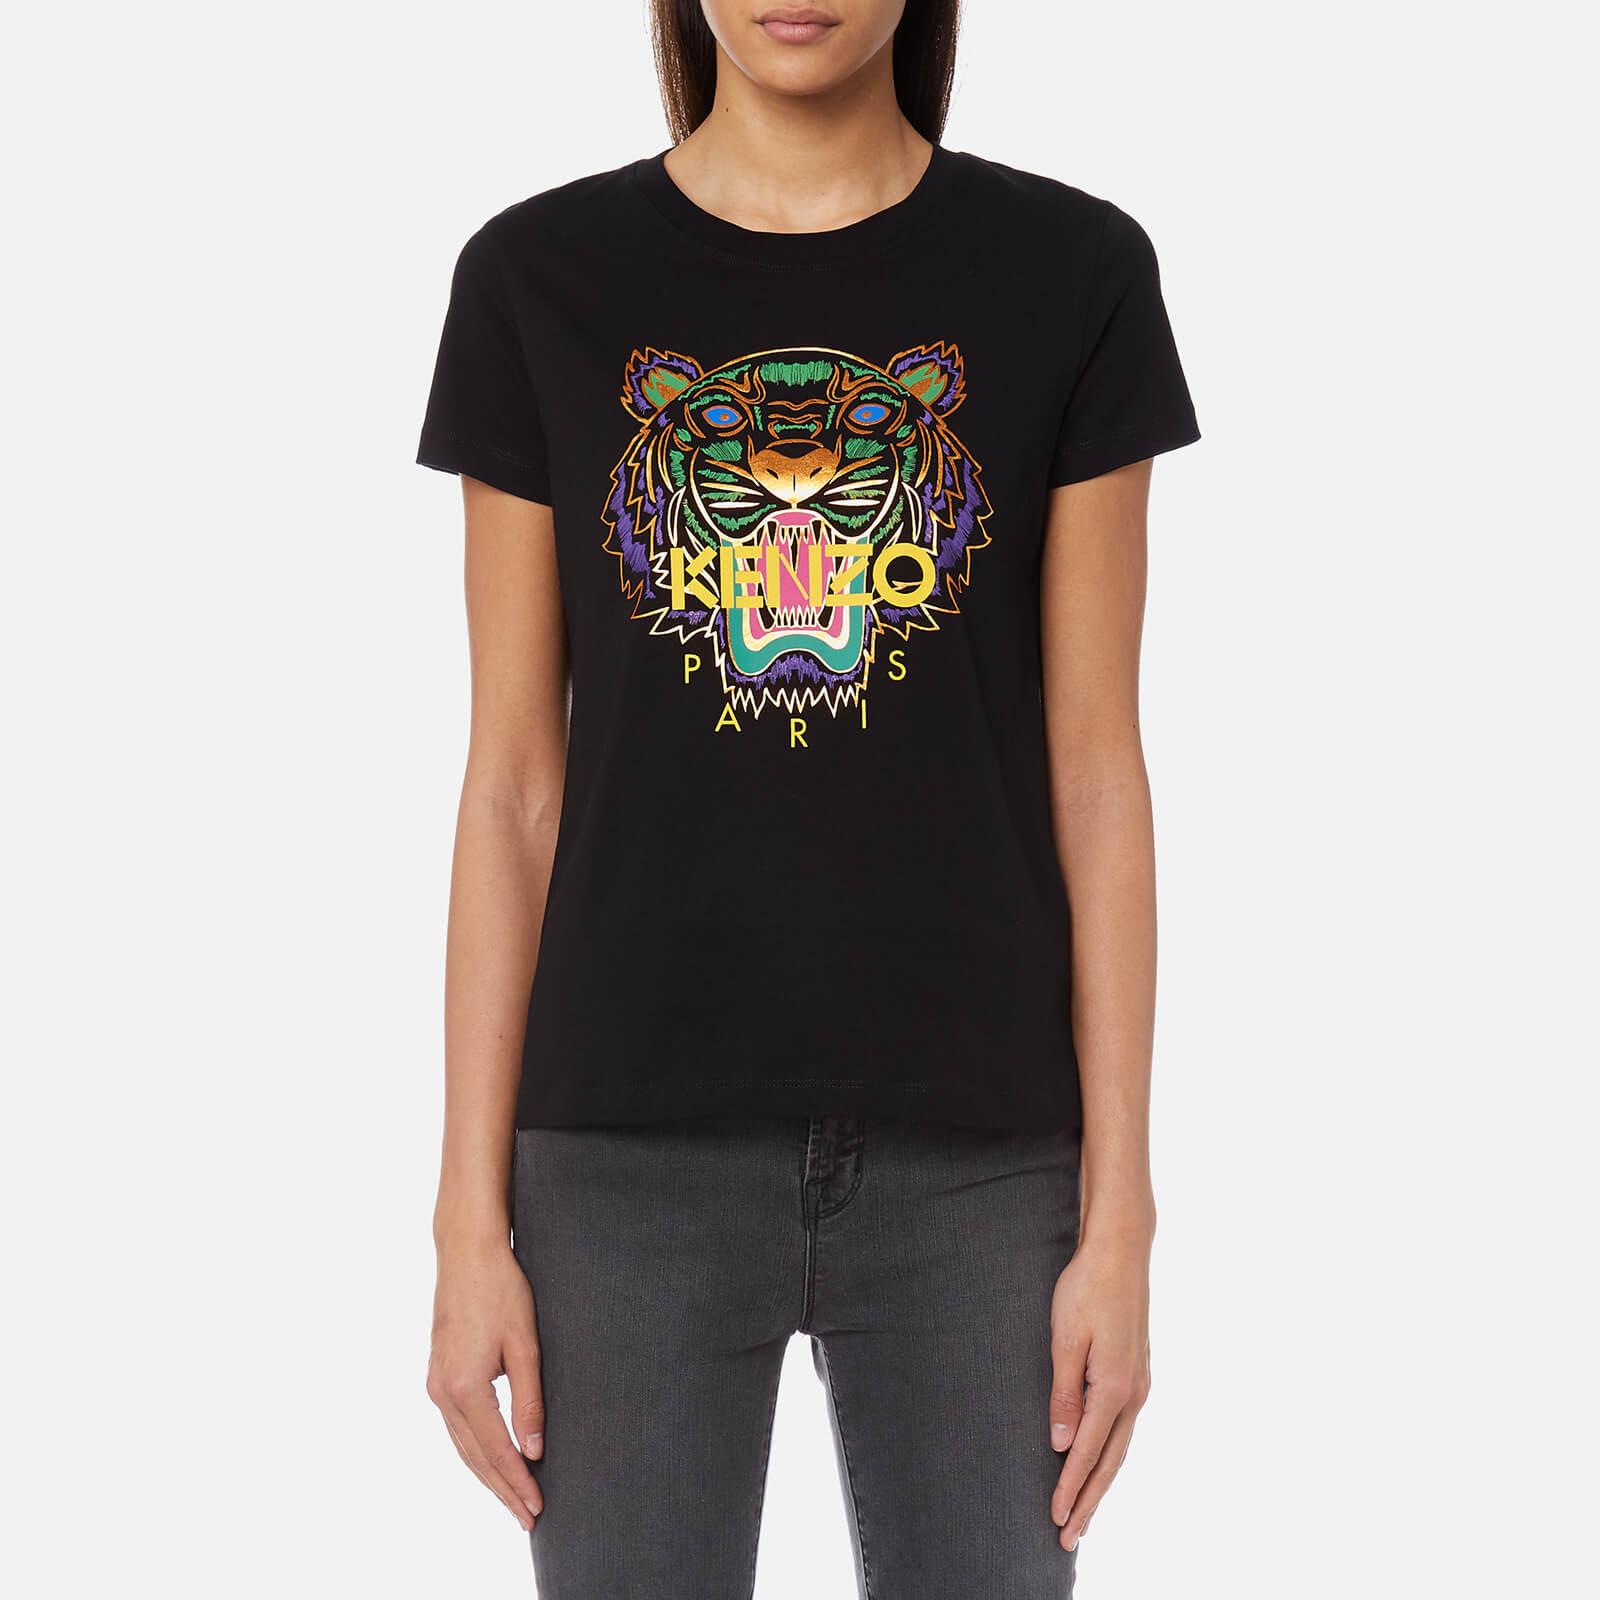 9cff8eaf8f9b KENZO Women's Tiger T-Shirt - Black - Free UK Delivery over £50